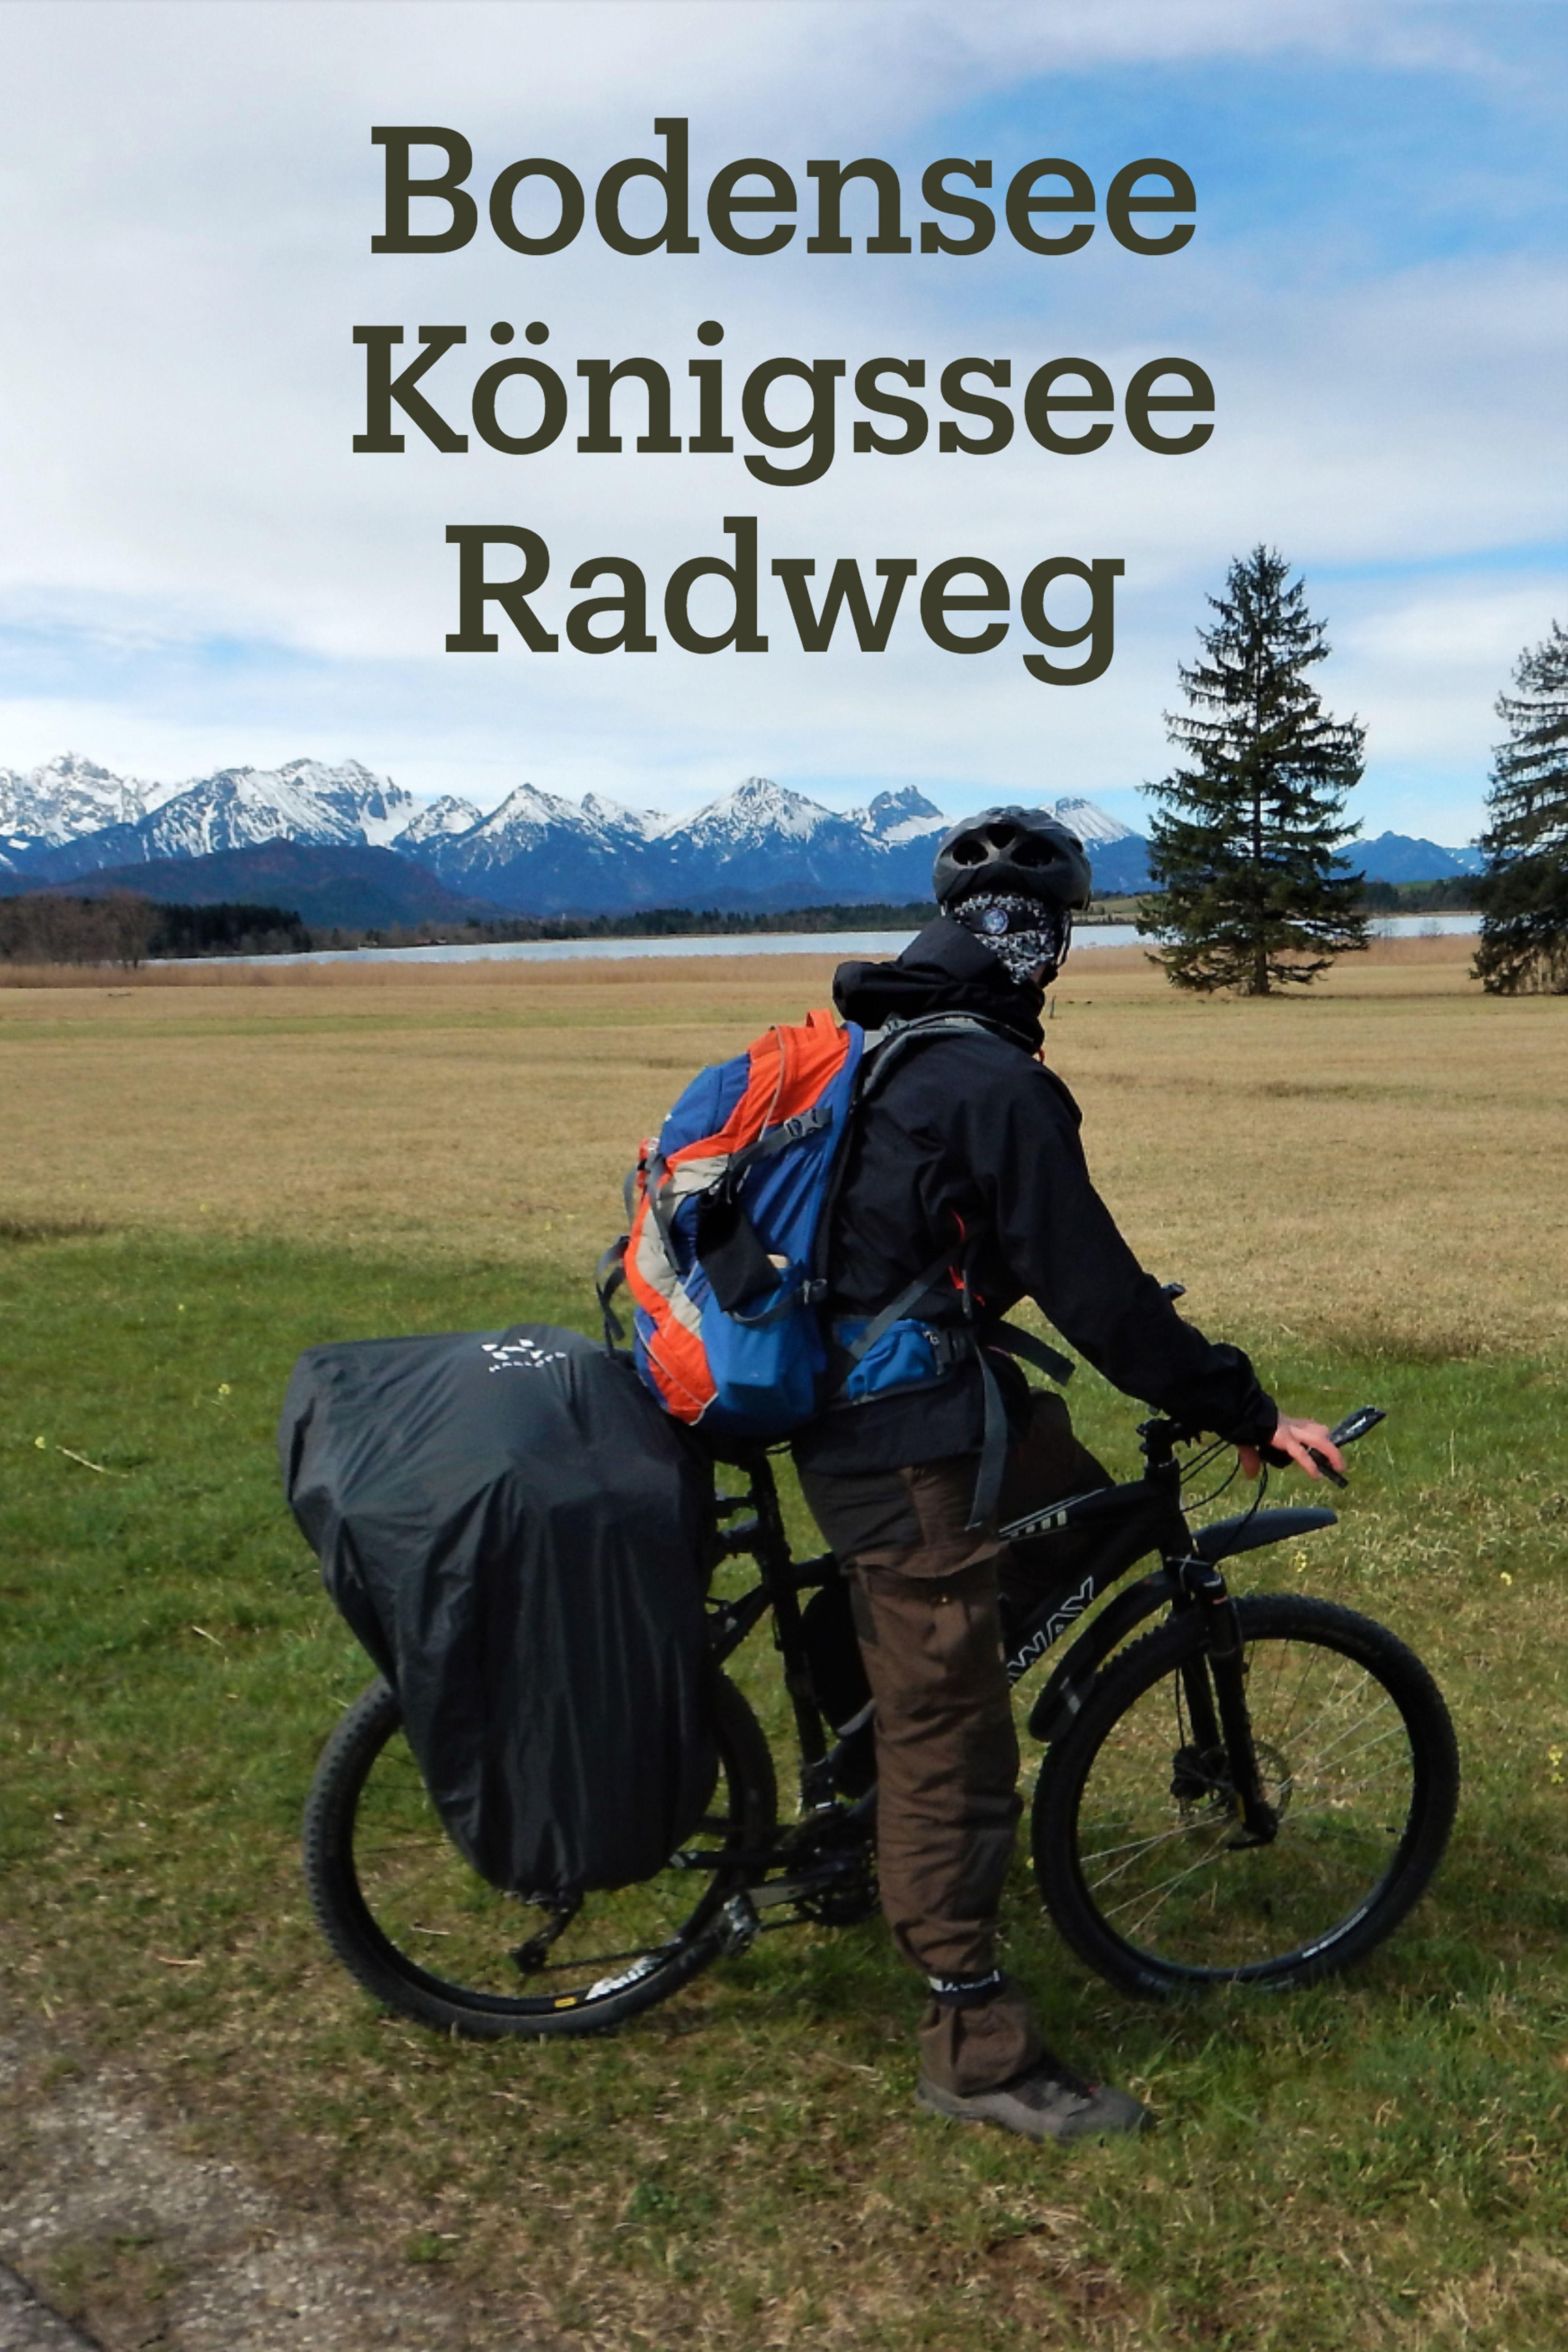 Bodensee Konigssee Radweg In 2020 Bodensee Radweg Lindau